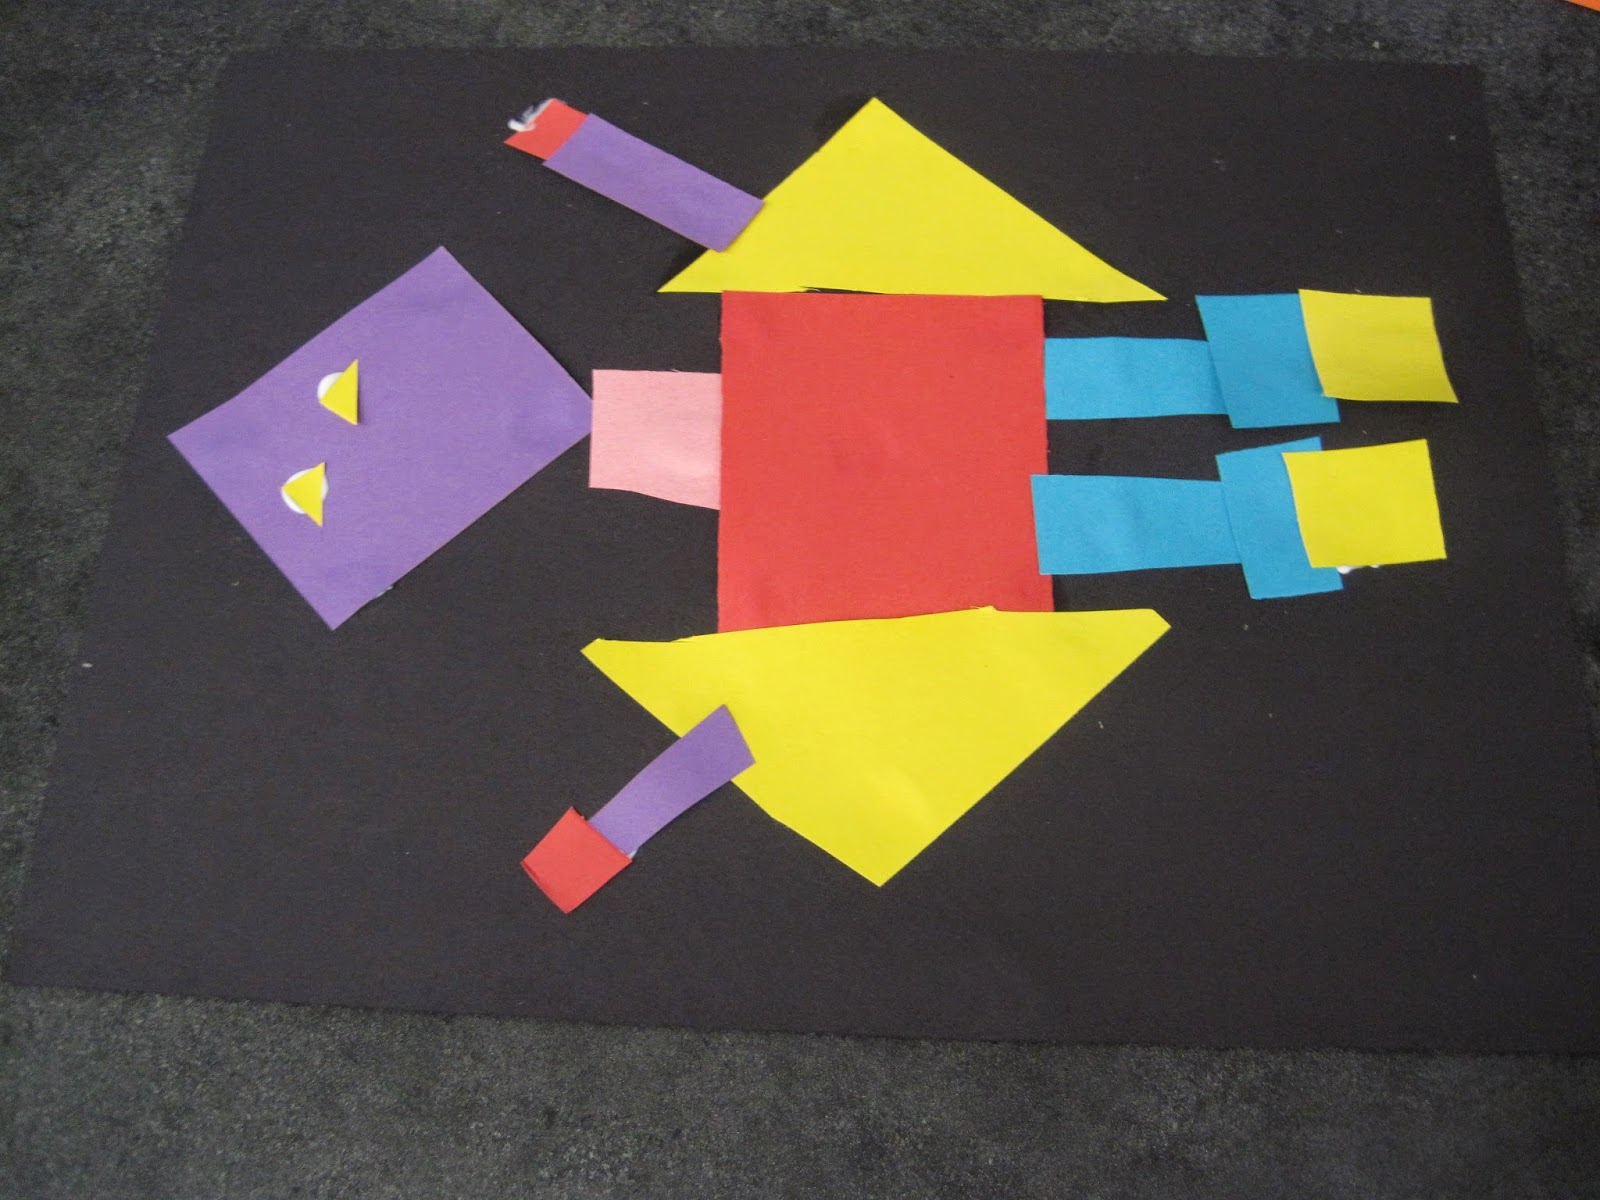 Elementary Shapes Students